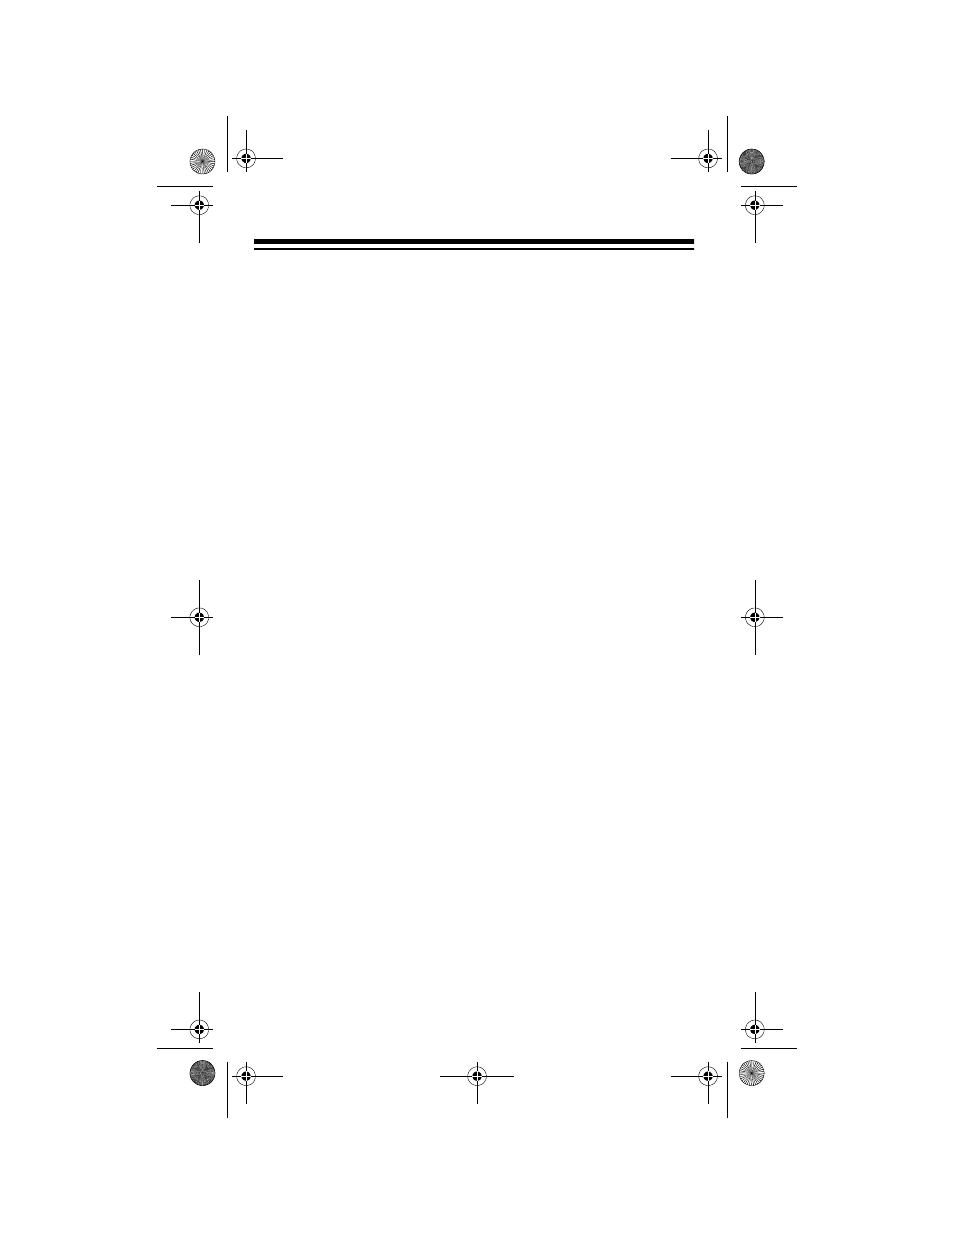 scanning channels radio shack pro 76 user manual page 26 48 rh manualsdir com Radio Shack Race Scanner Manual Program Radio Shack Portable Scanner